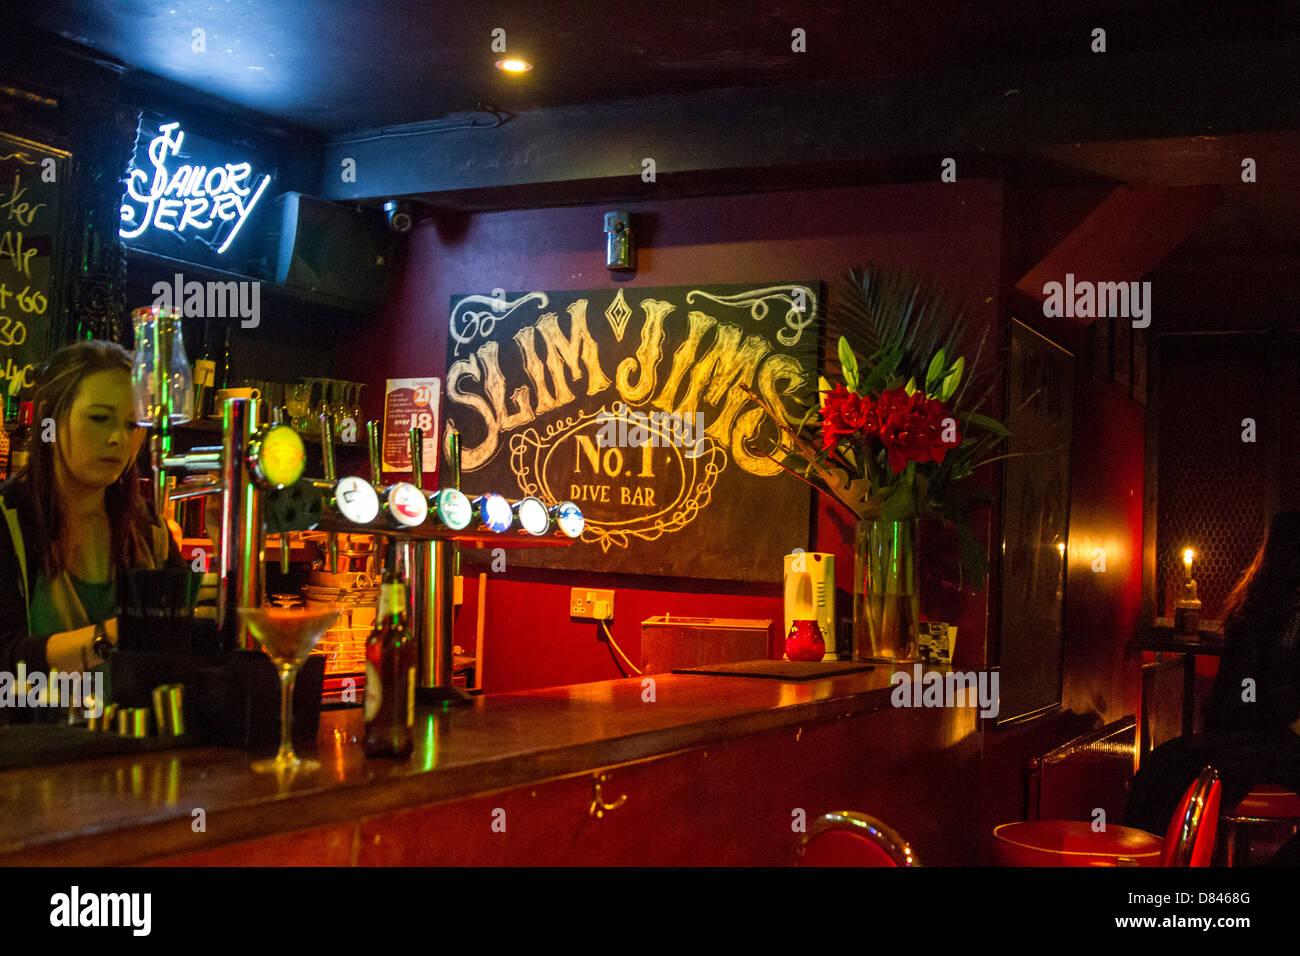 Slim Jims bar in Angel - Stock Image